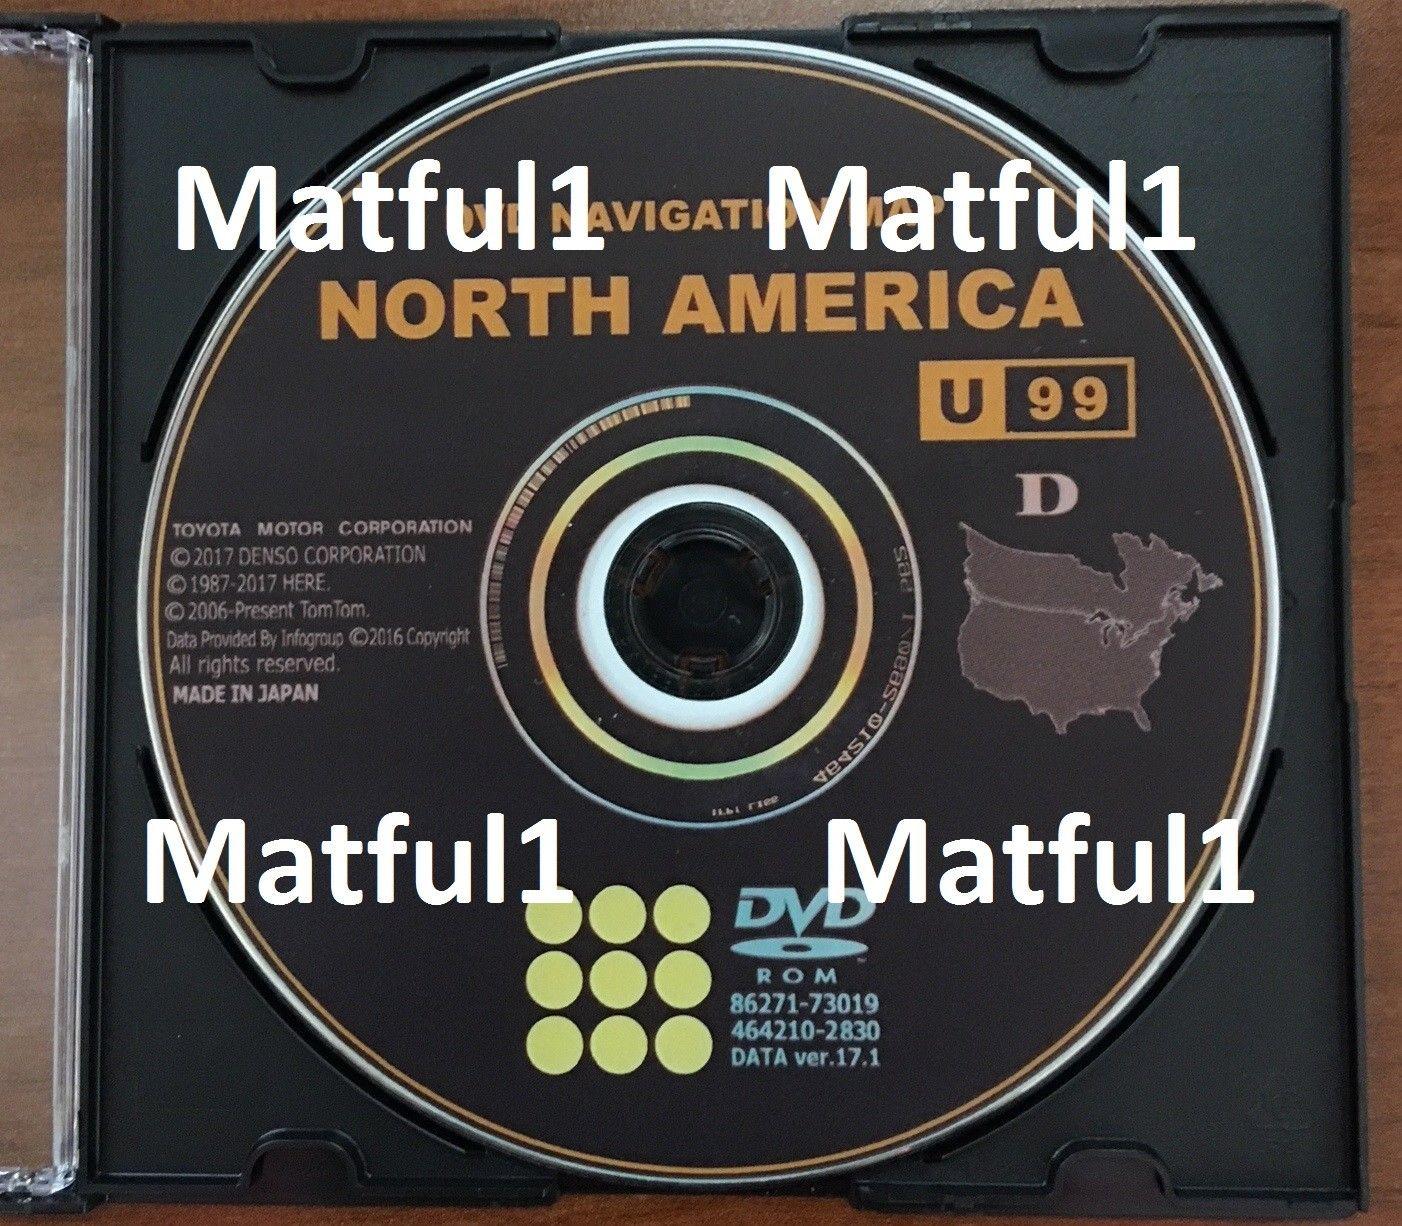 on dvd navigation map north america toyota